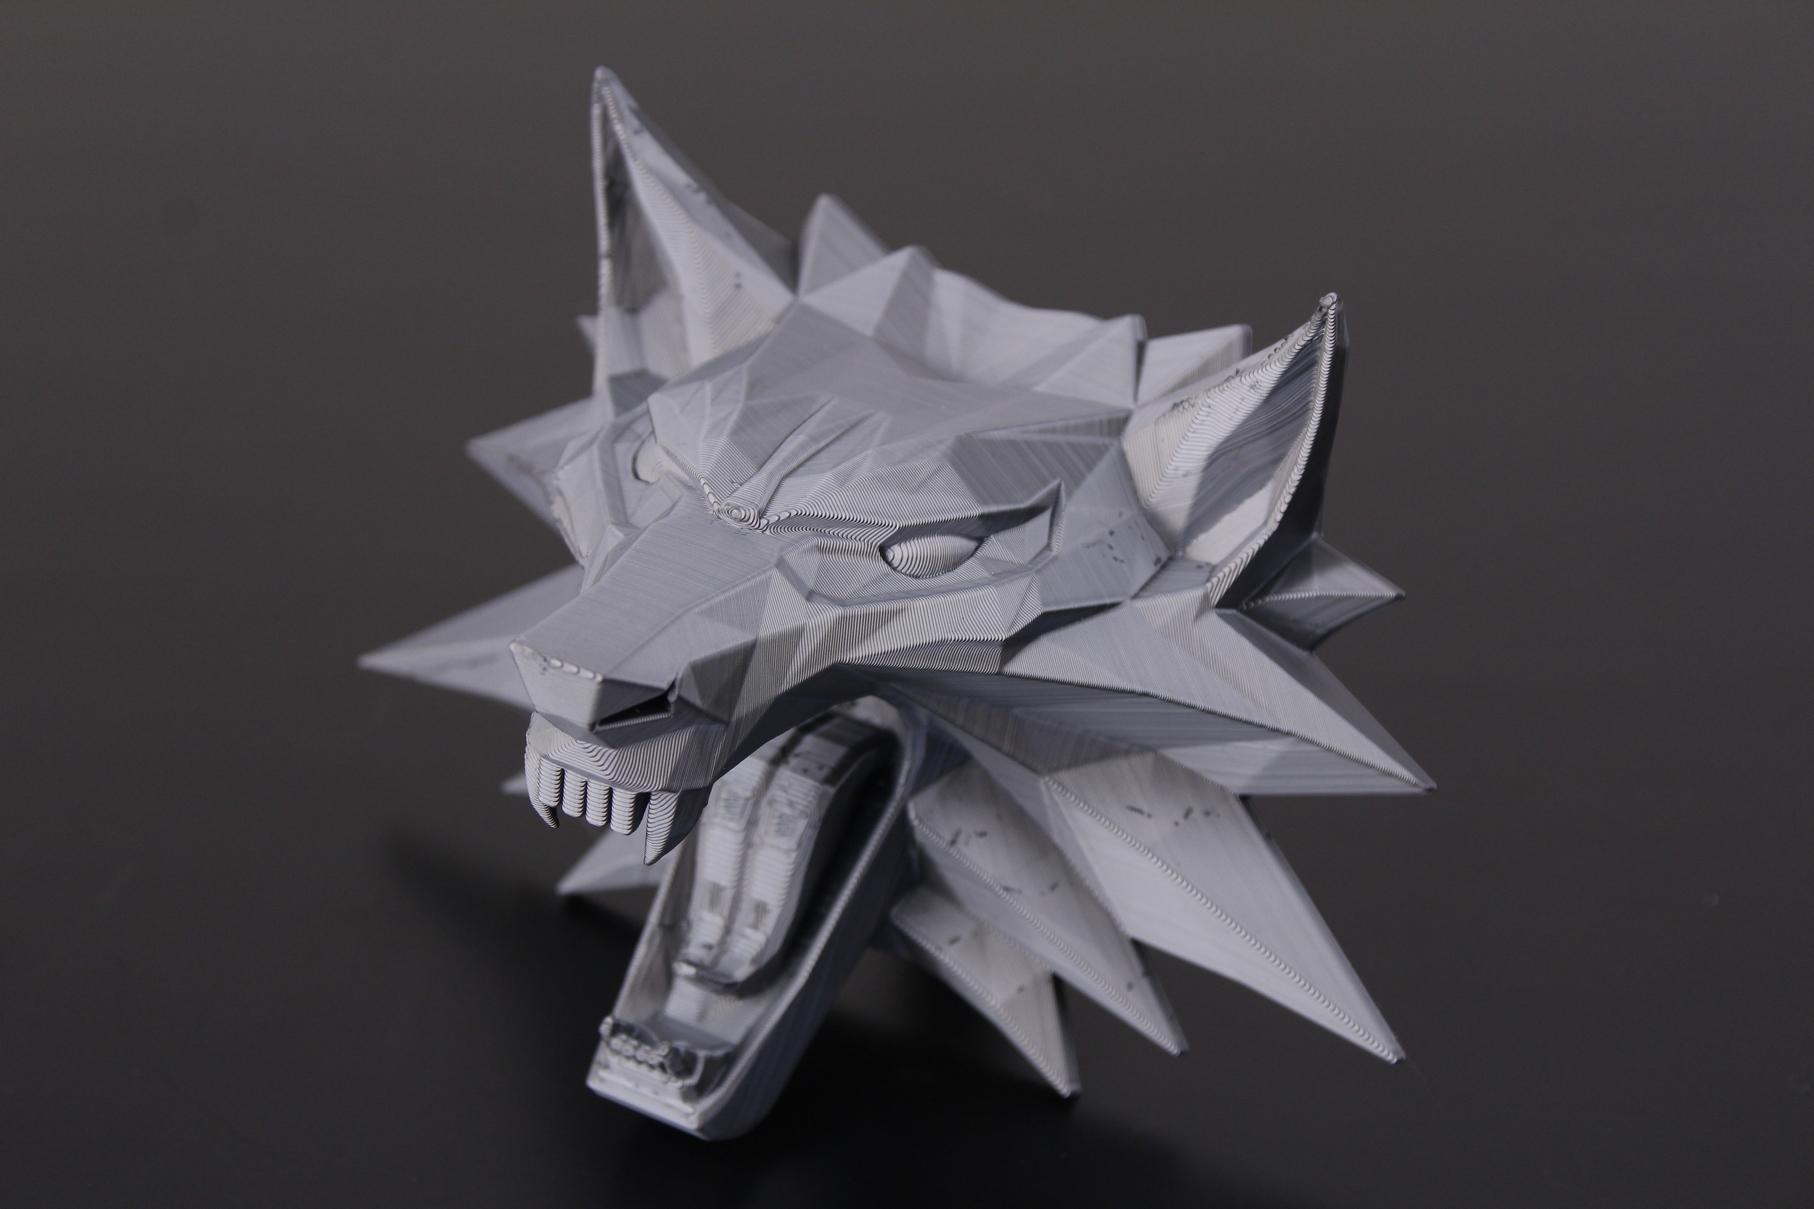 Witcher Wolf Medallion 4   Trianglelab Spiral Tower Hotend Review